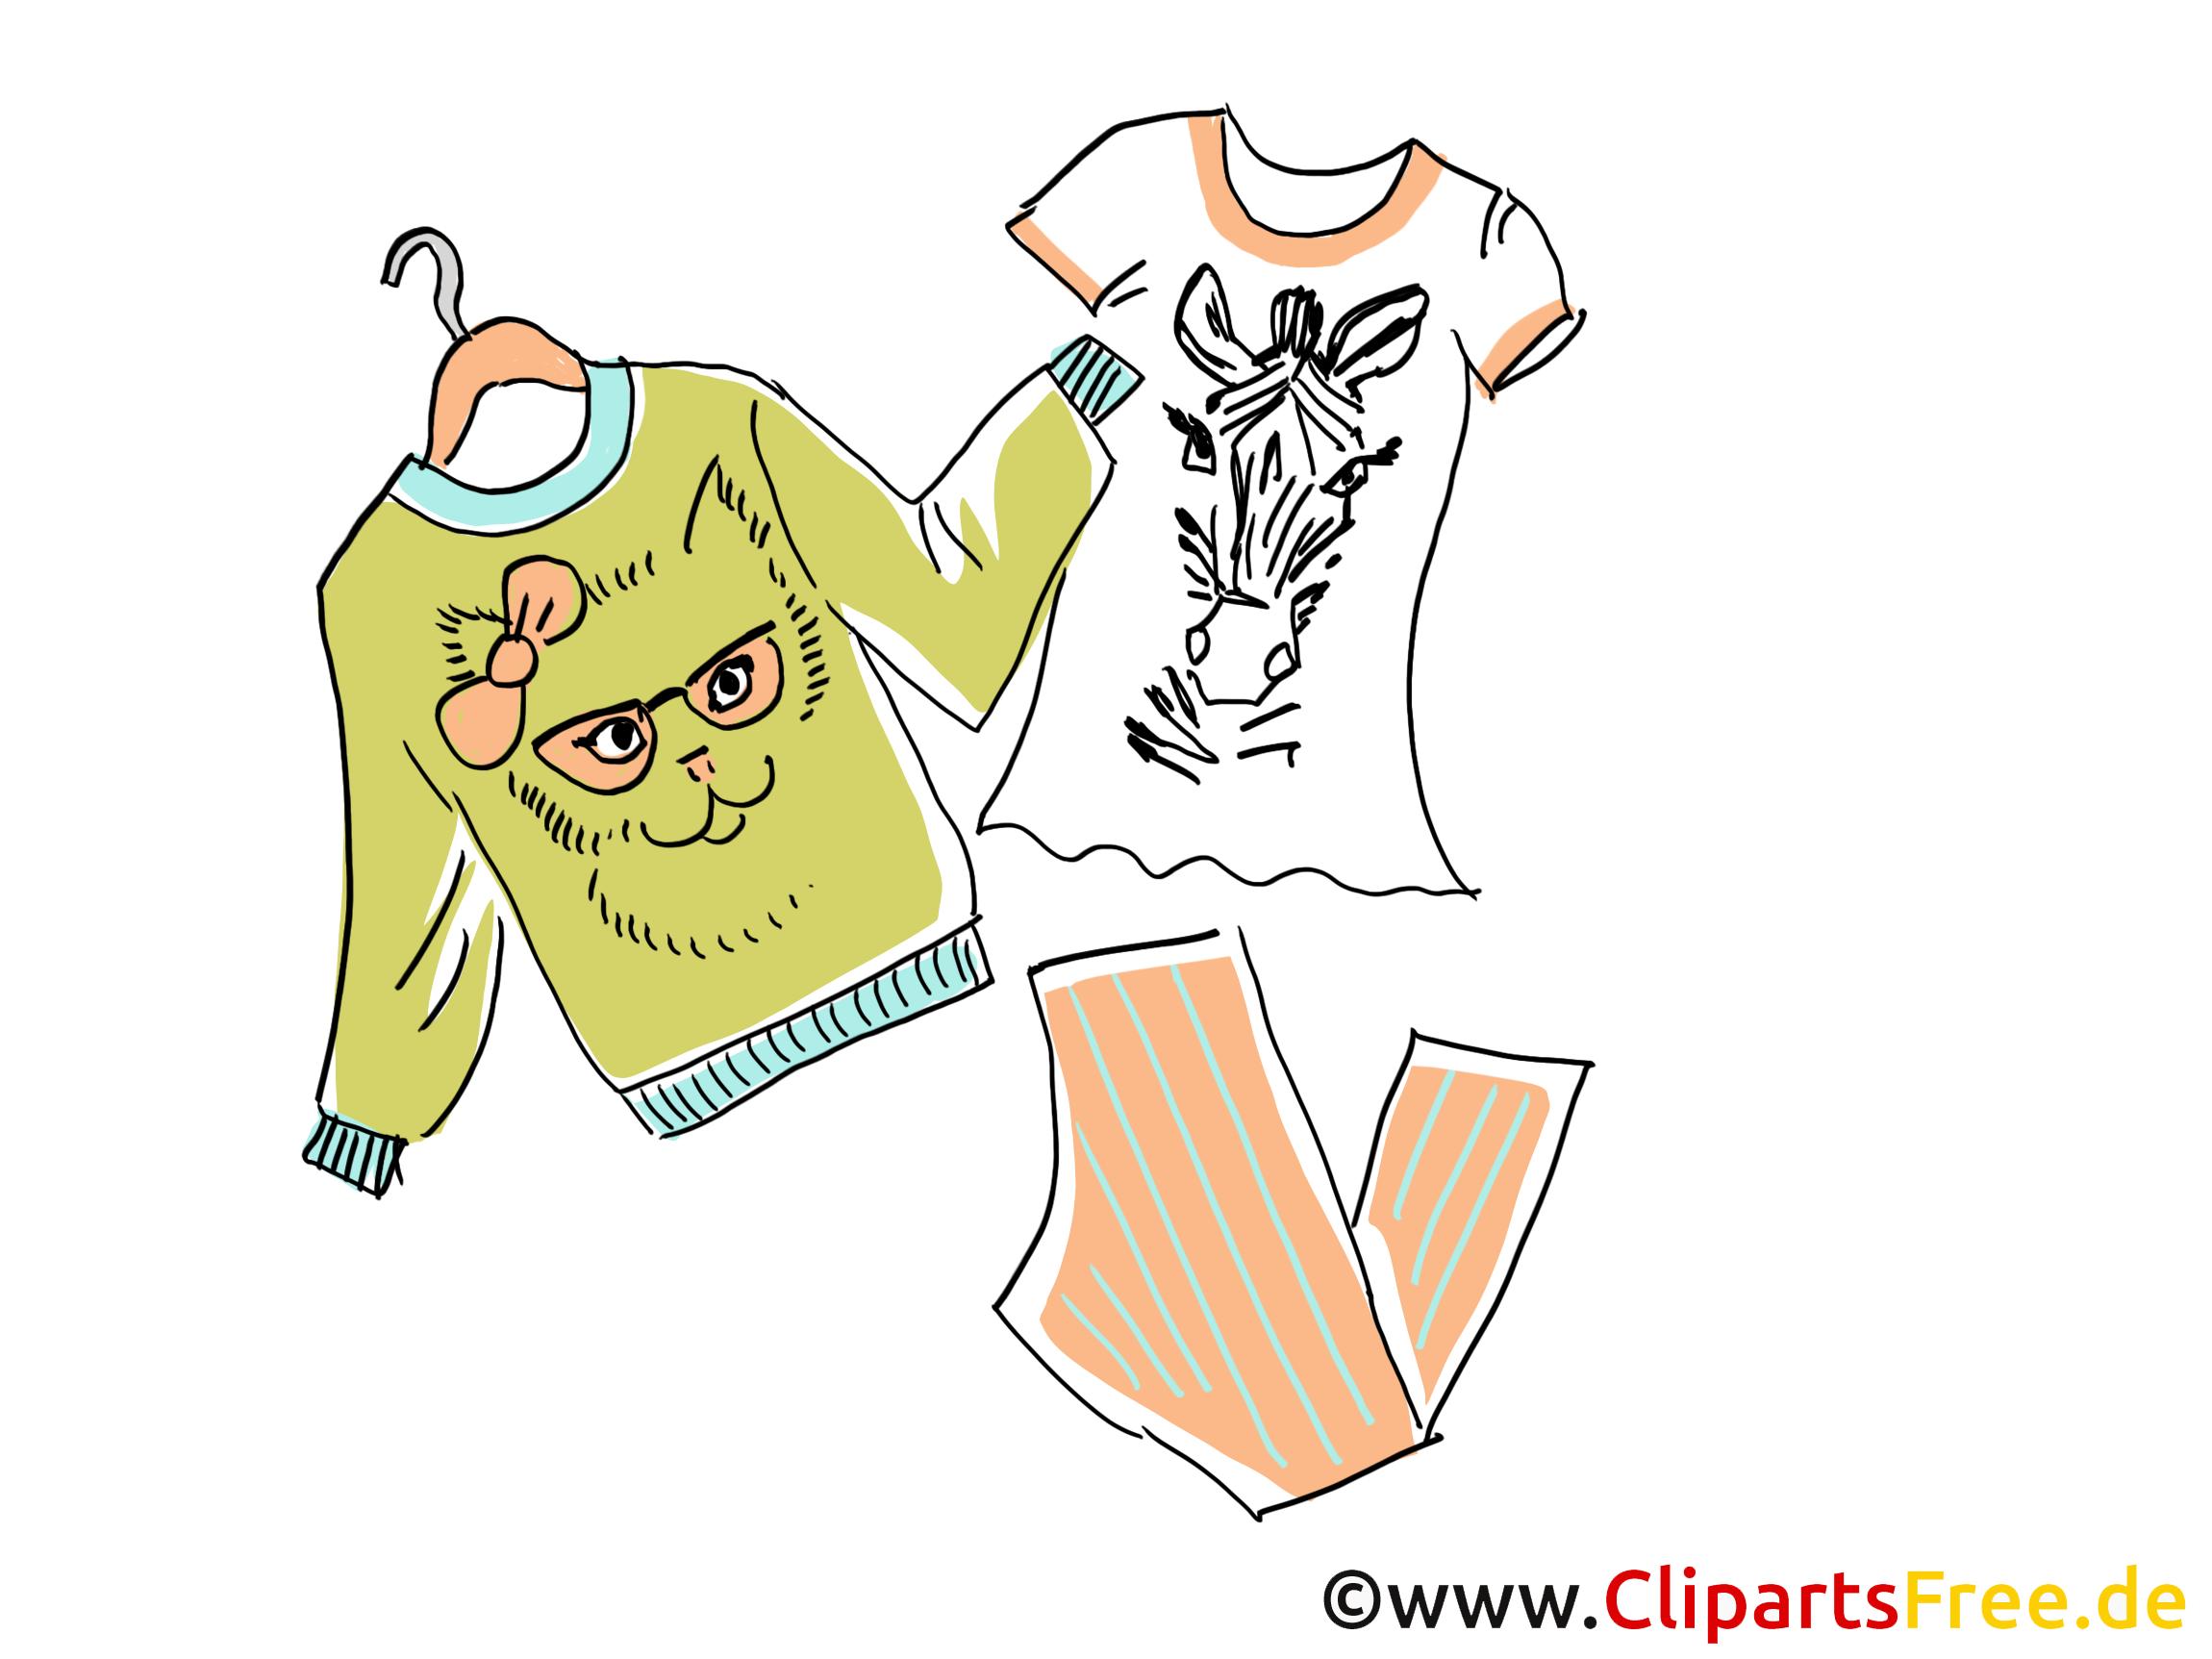 Designer Mode Clipart, Bild, Illustration, Grafik,  Image kostenlos